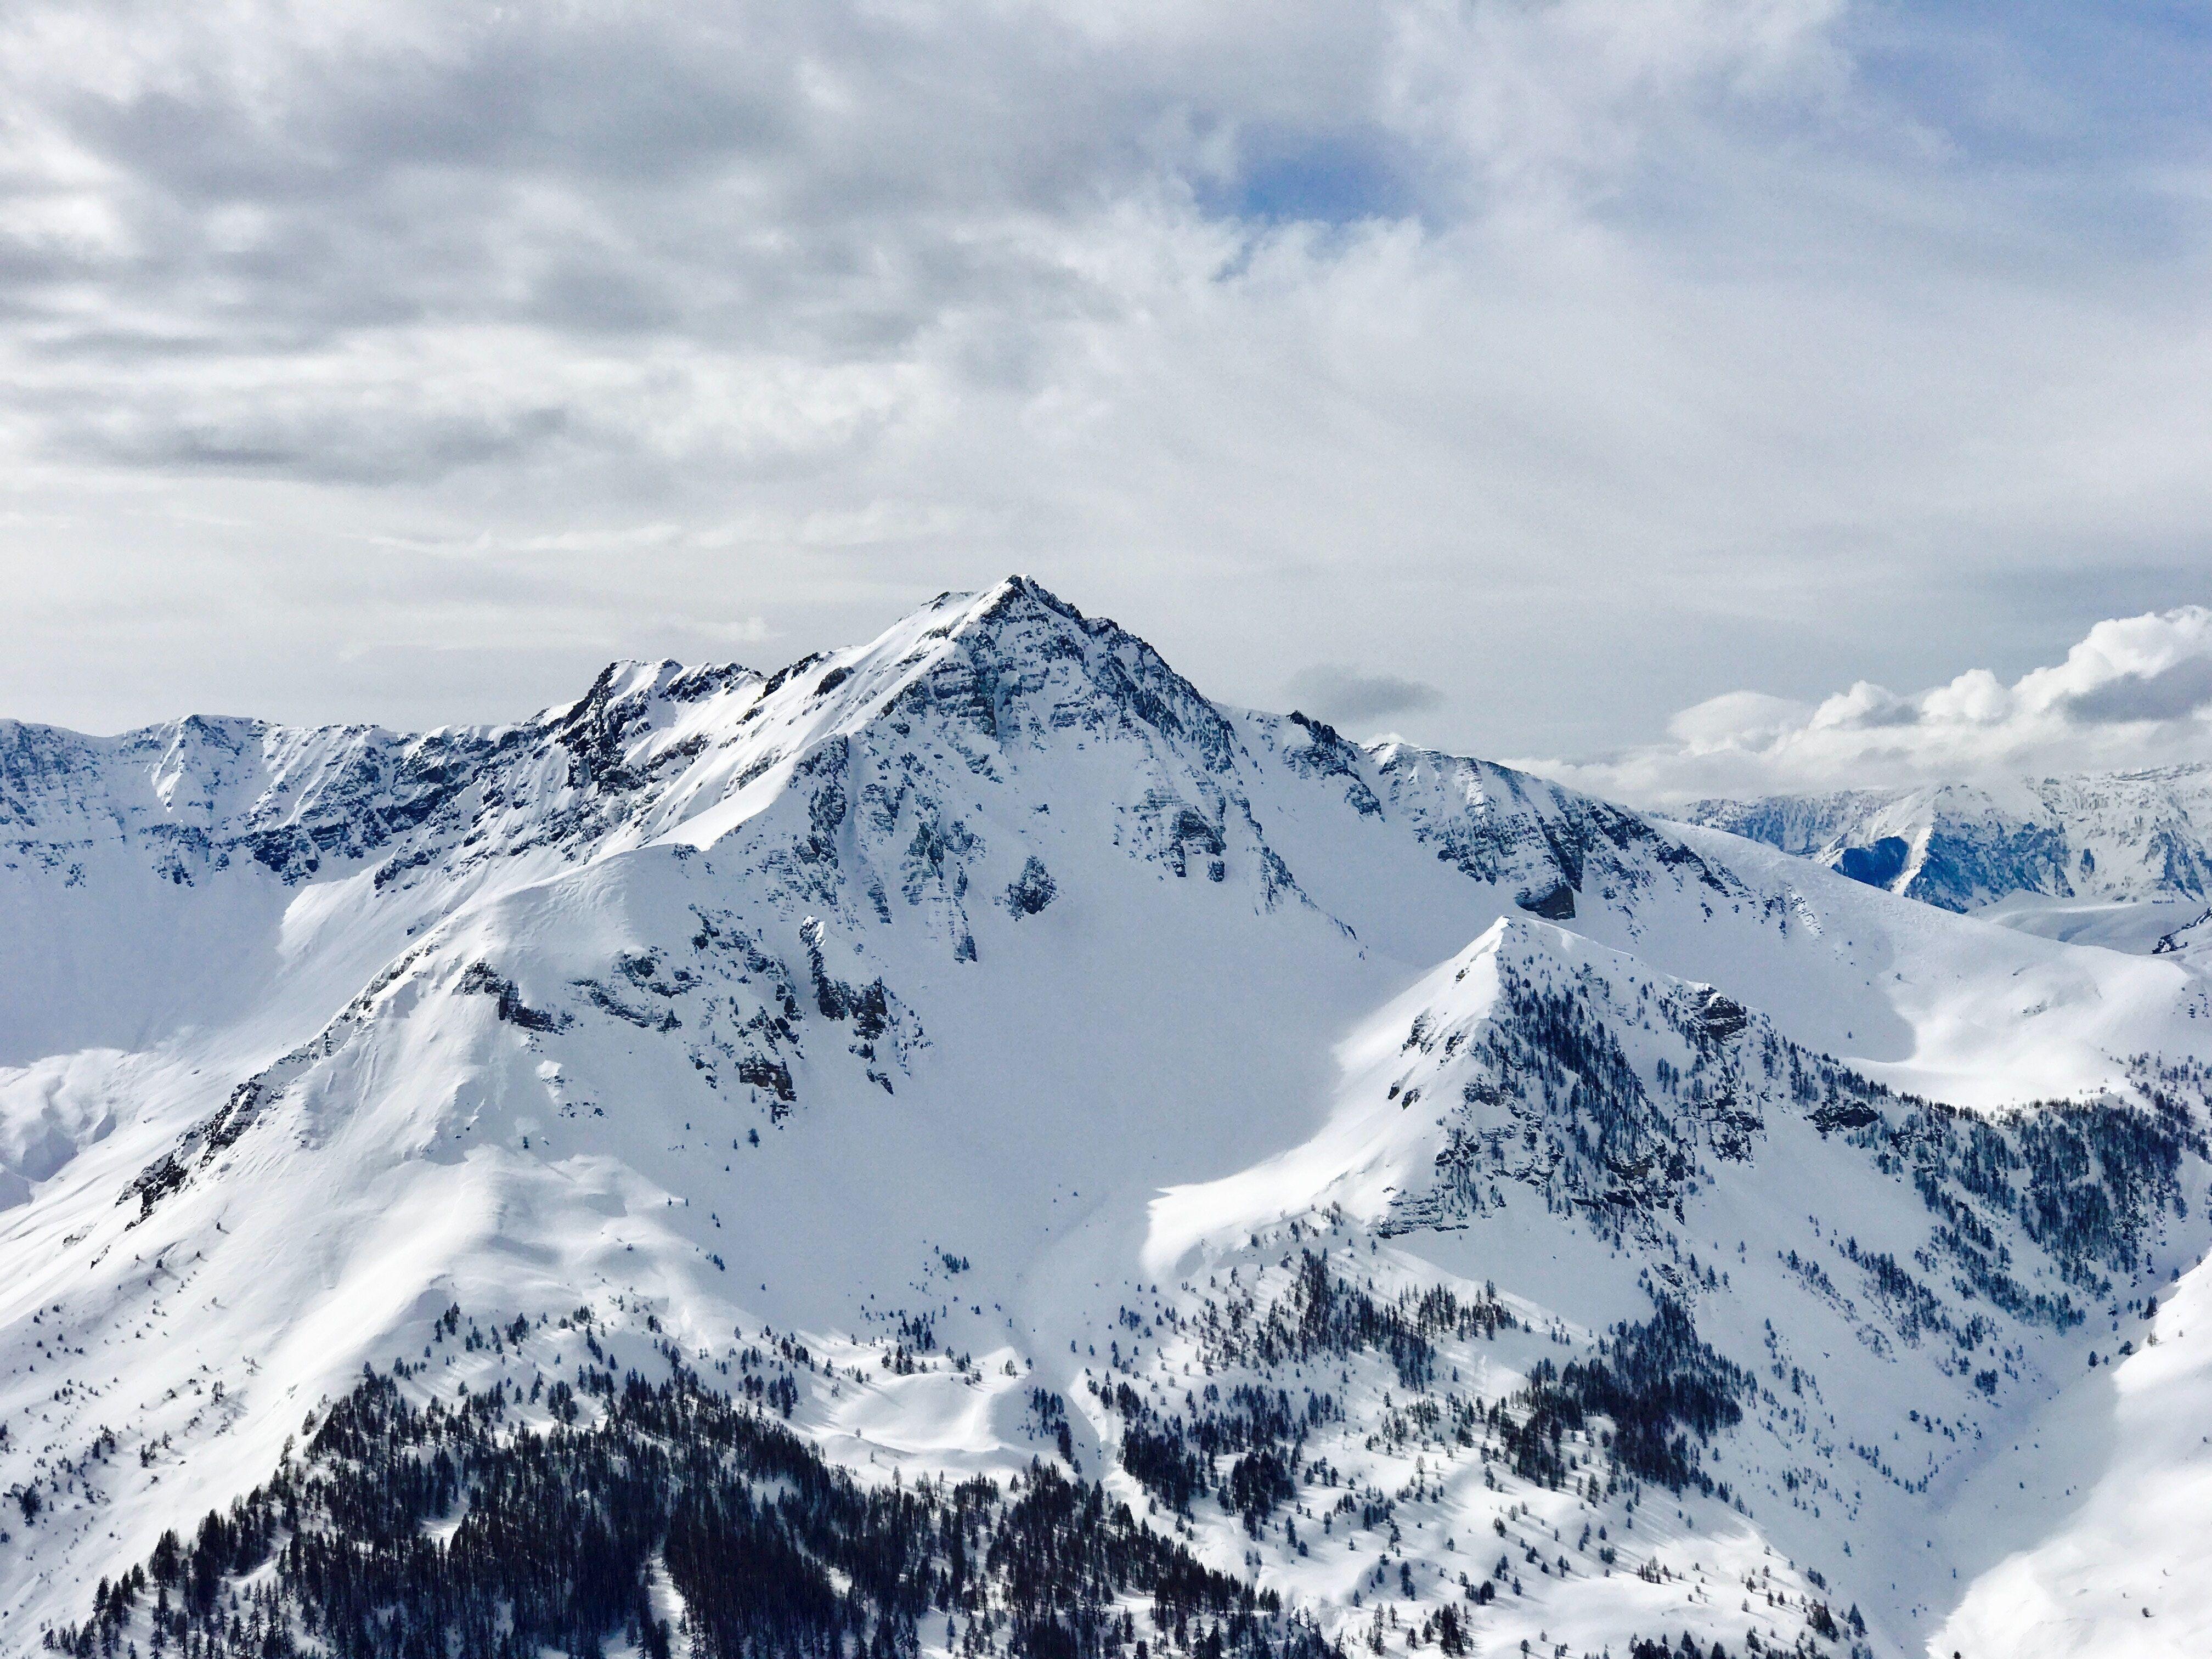 Snowy Mountains Snowy Mountains Beautiful Mountains Mountain Landscape